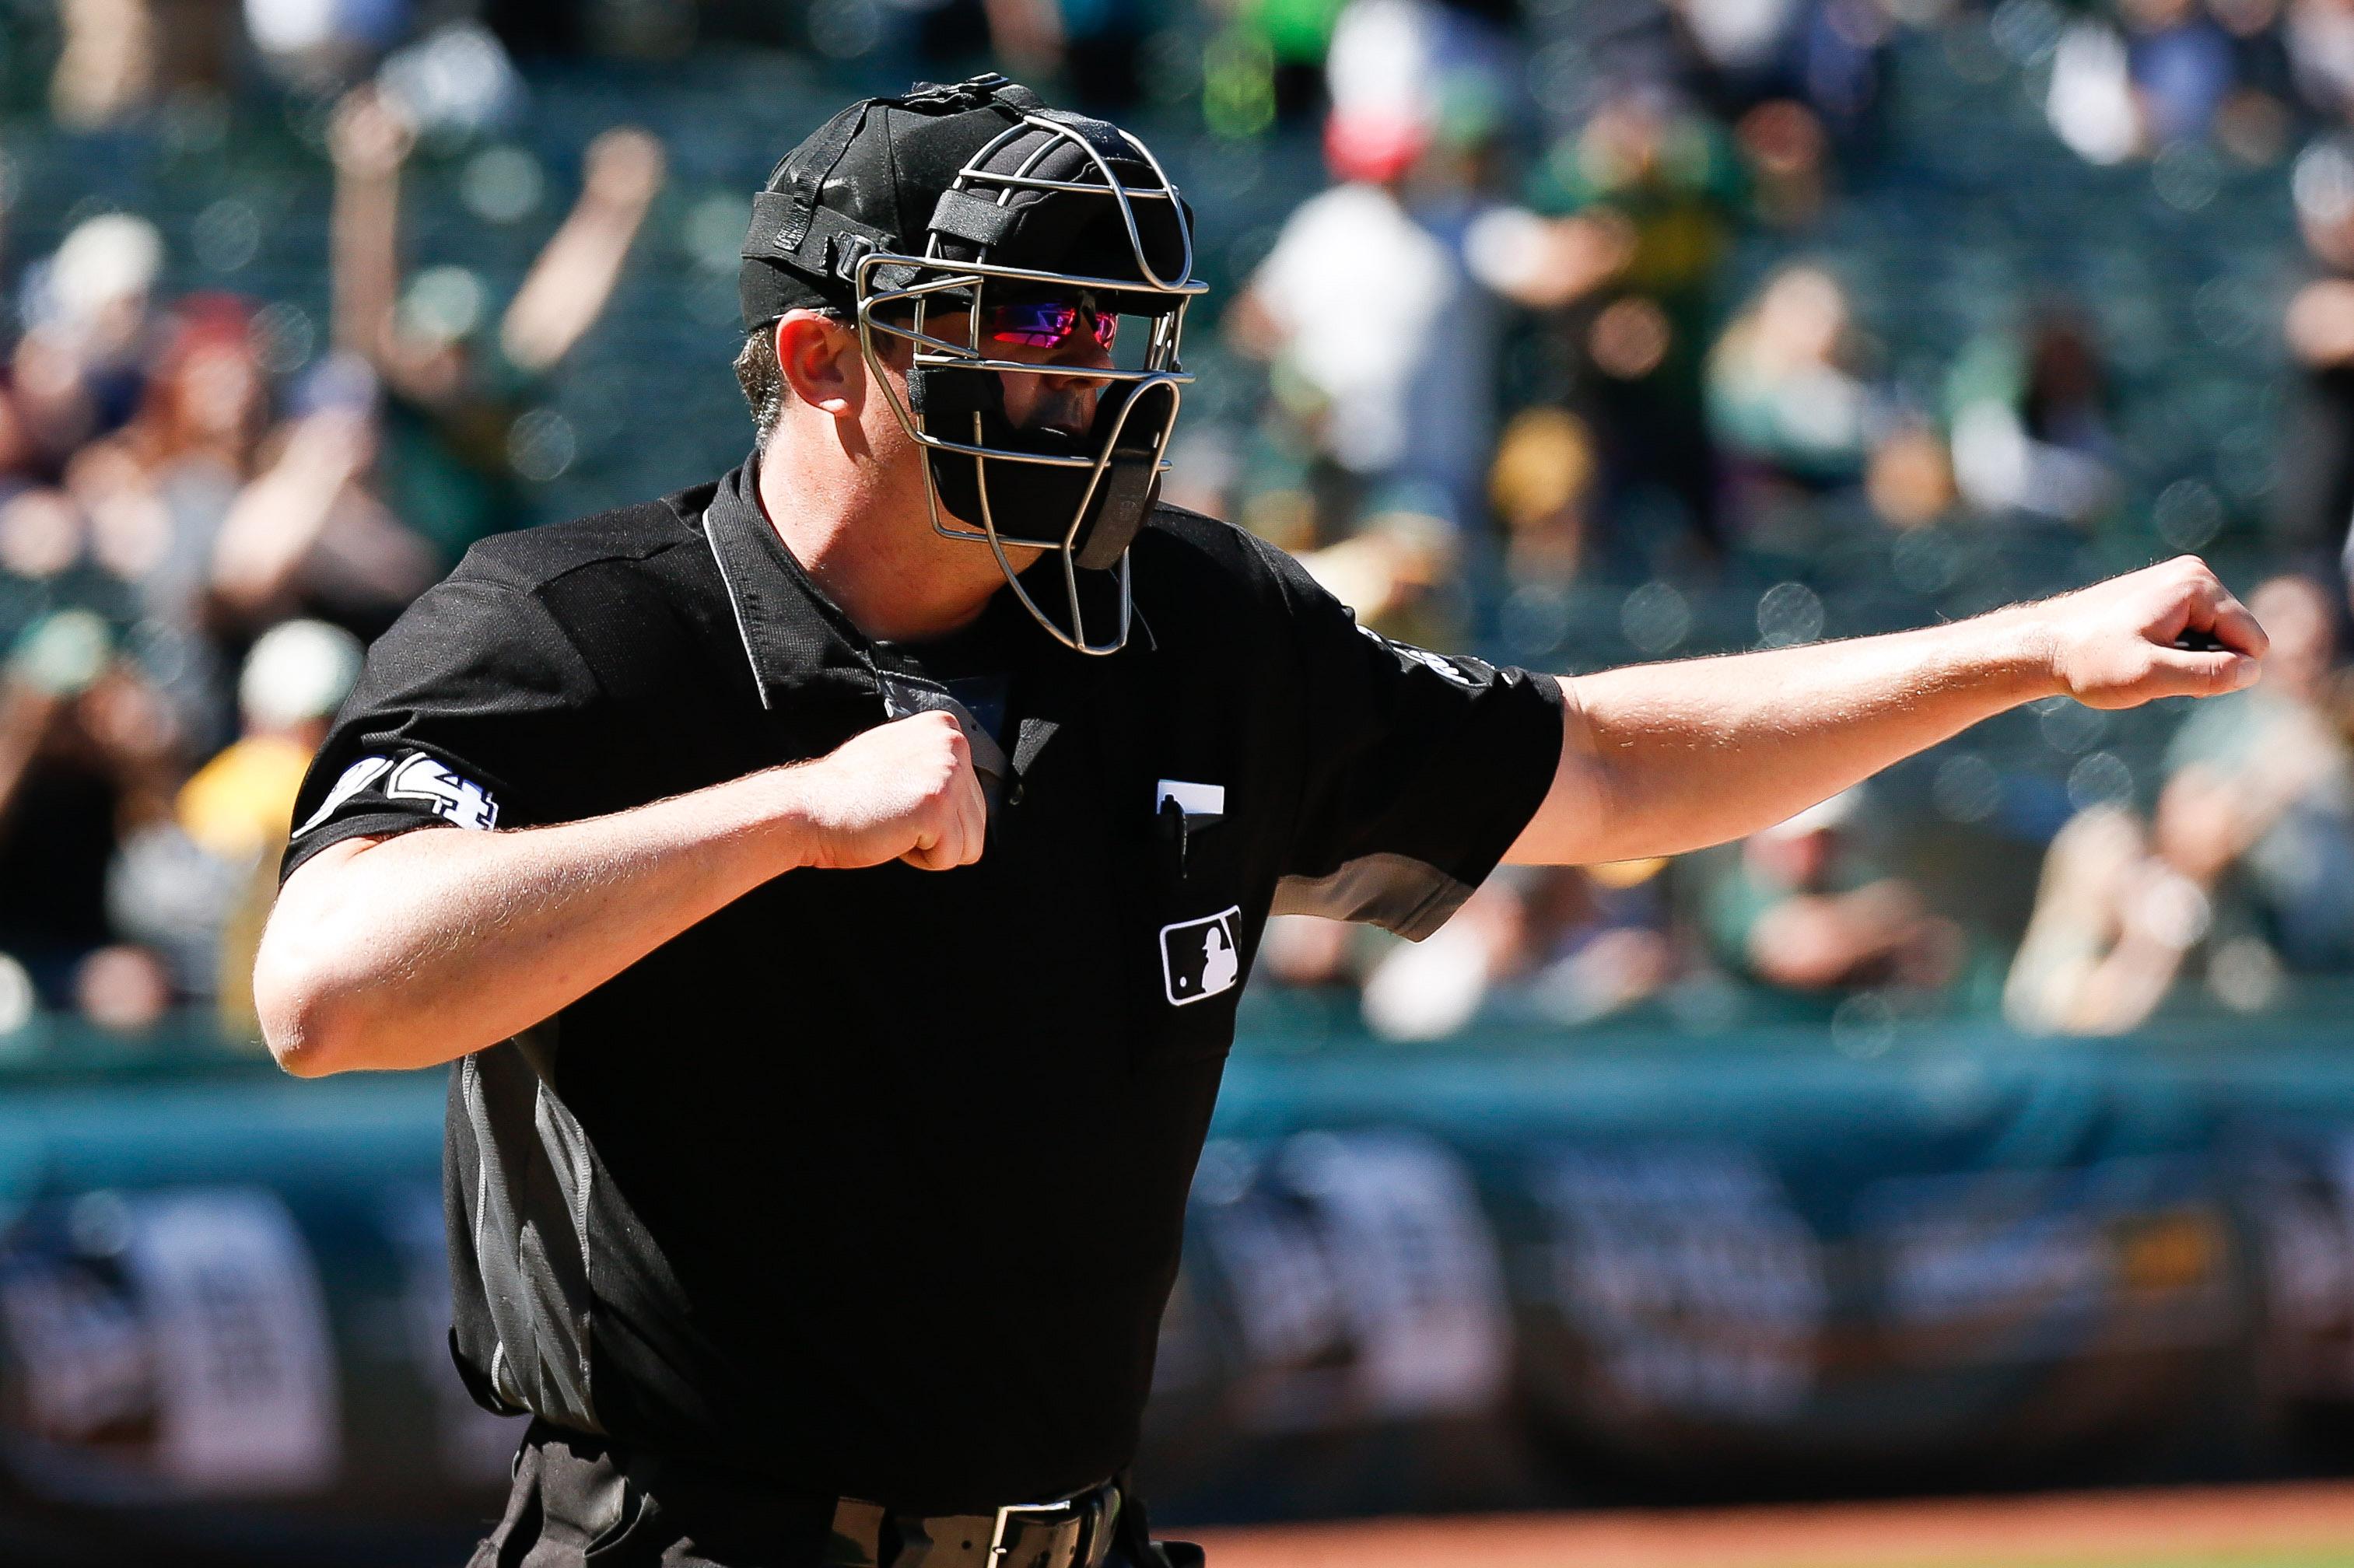 Fantasy Freestyle: The Strikeout Spike That Isn't - Baseball Prospectus